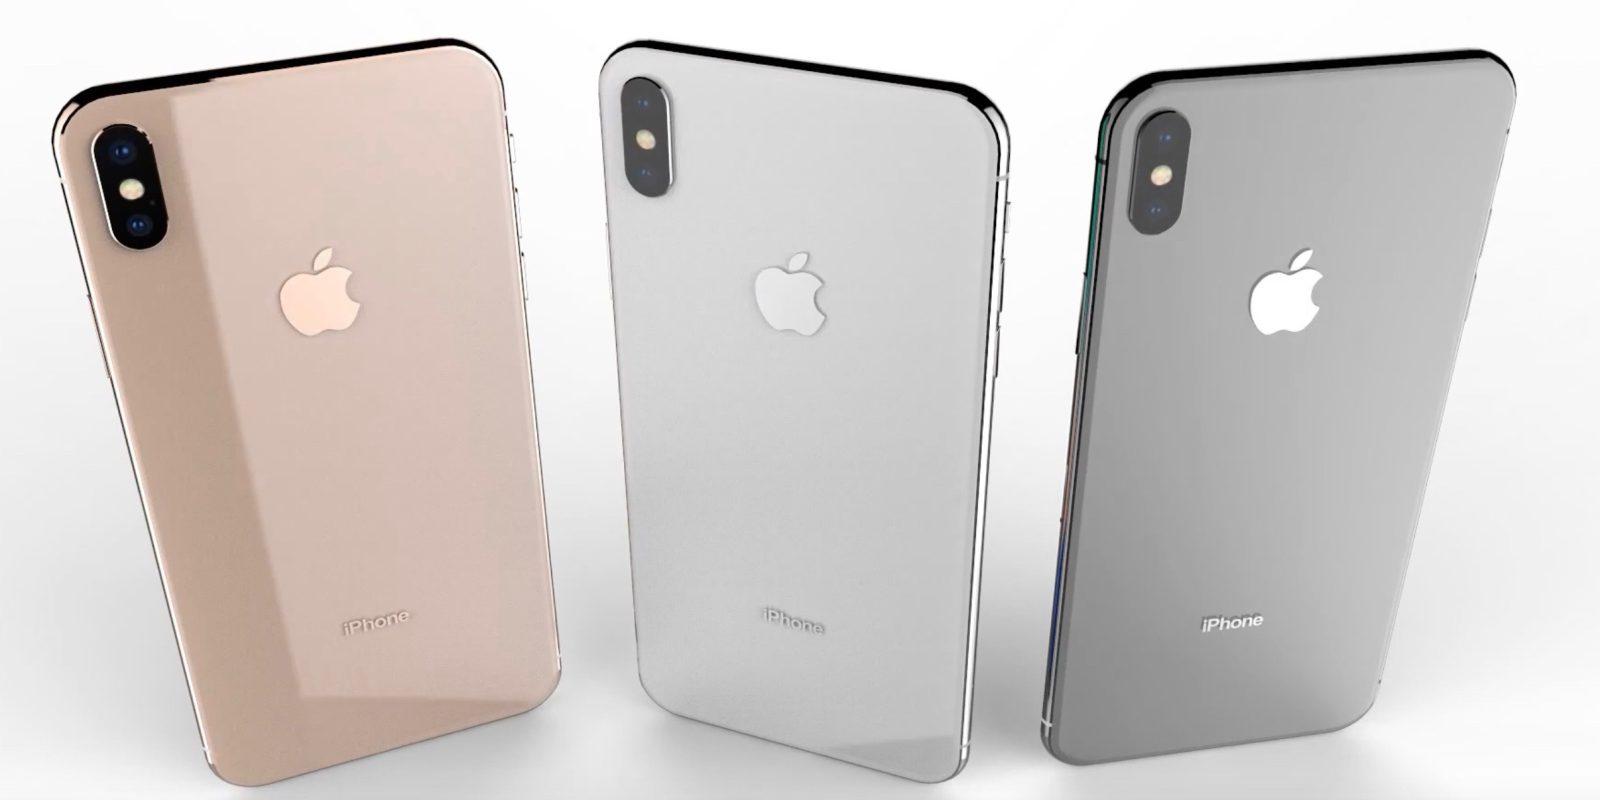 iPhone X Plus : des améliorations qui raviront les Apple addict